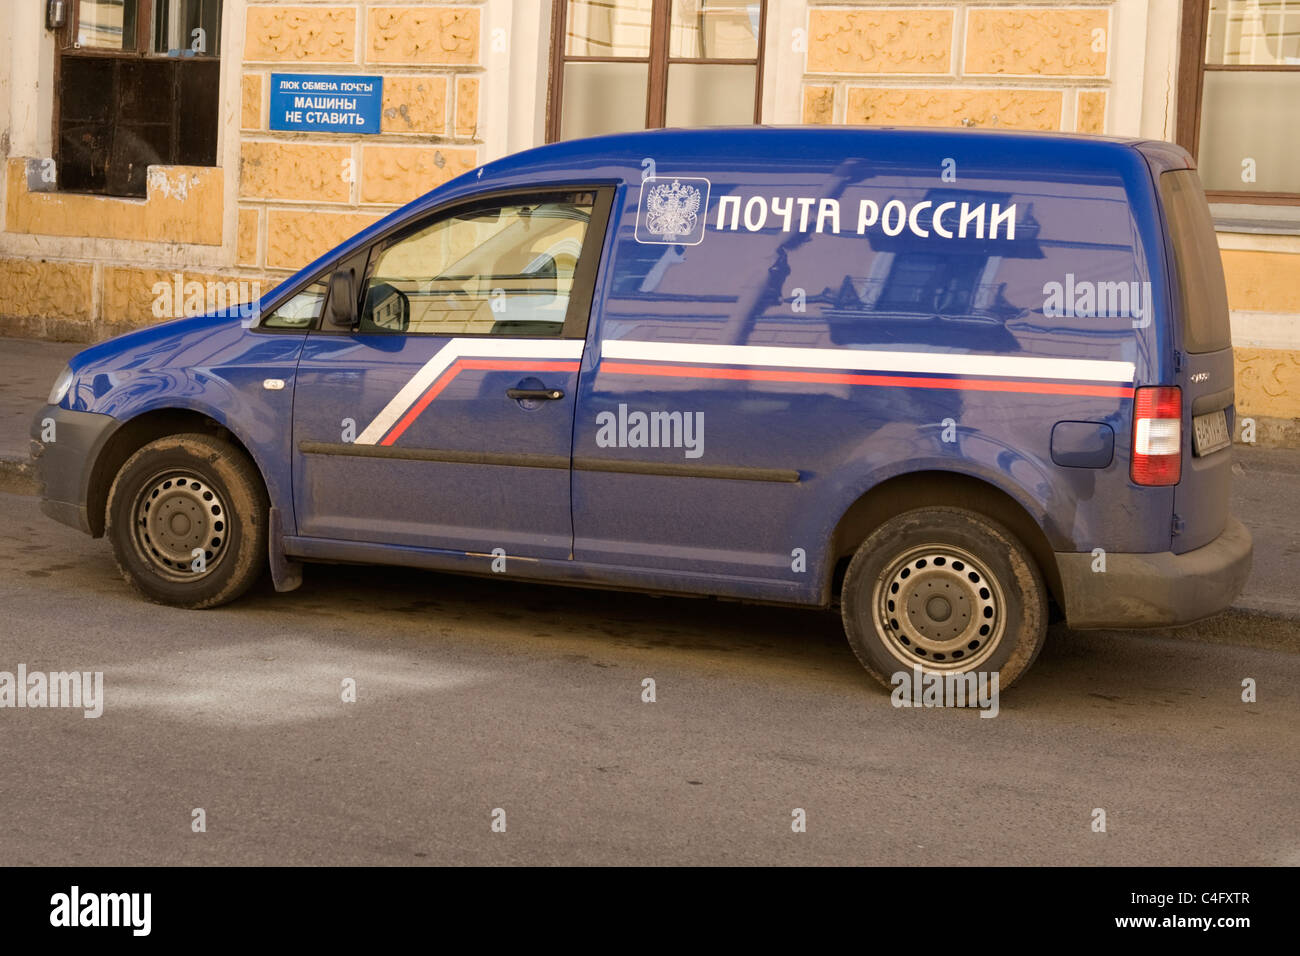 Russia St Petersburg Russian Postal Service dark blue dirty van parked outside main post office street scene - Stock Image